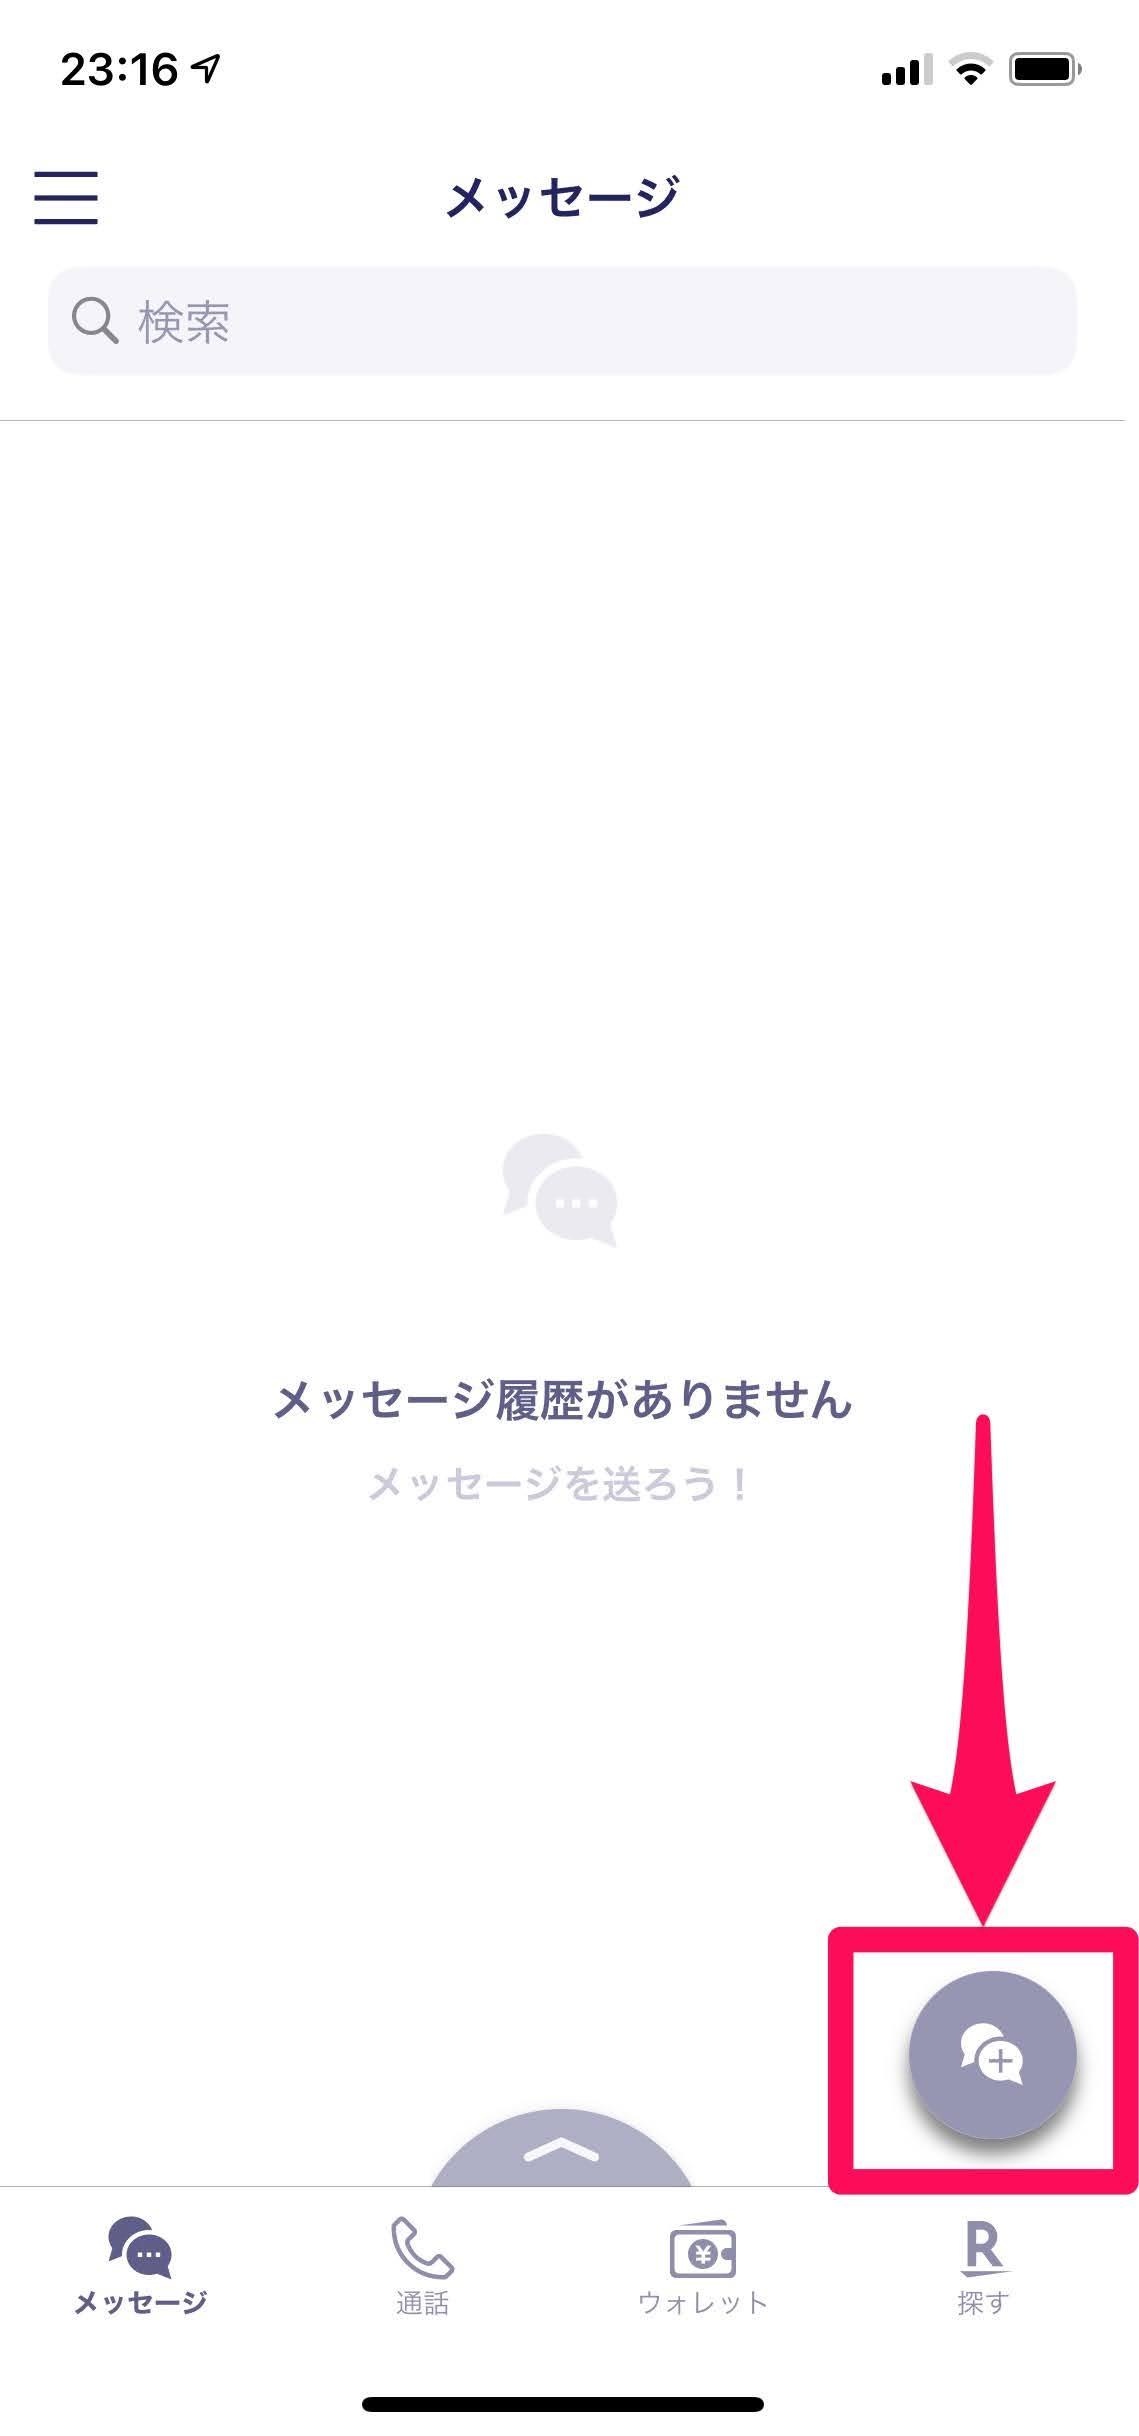 Rakuten Link 国際SMSの手順01